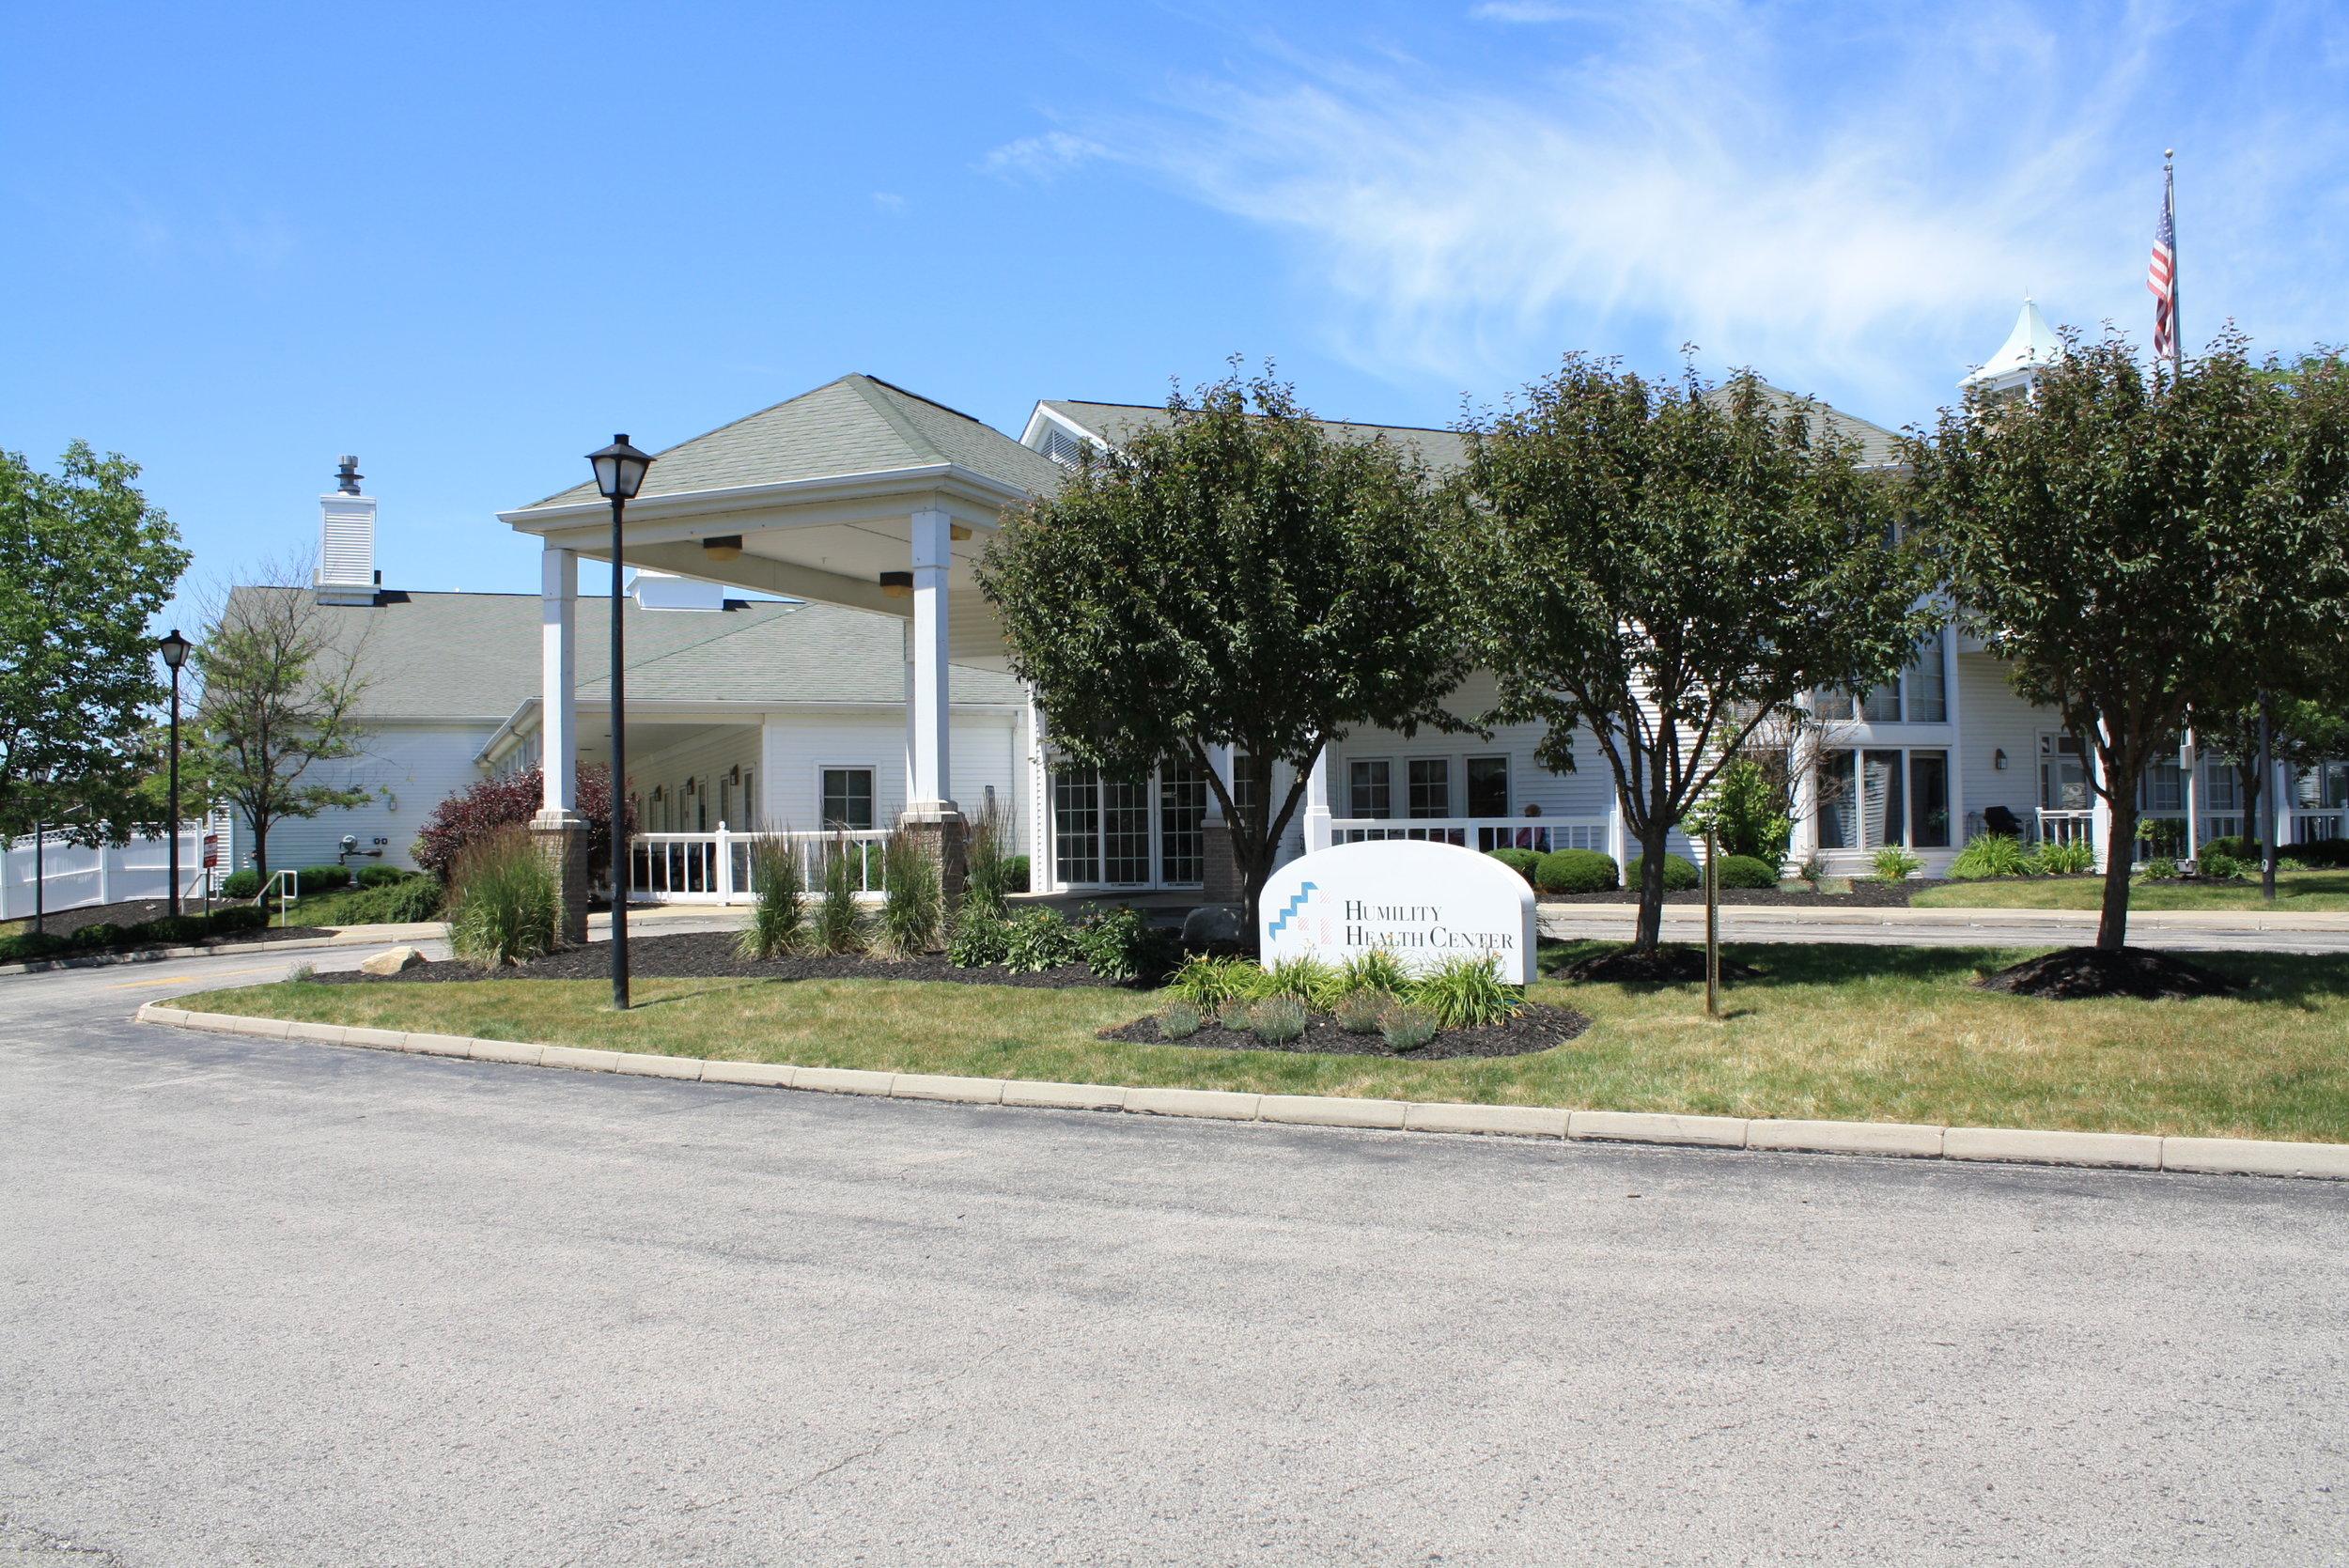 Assumption Nursing Center